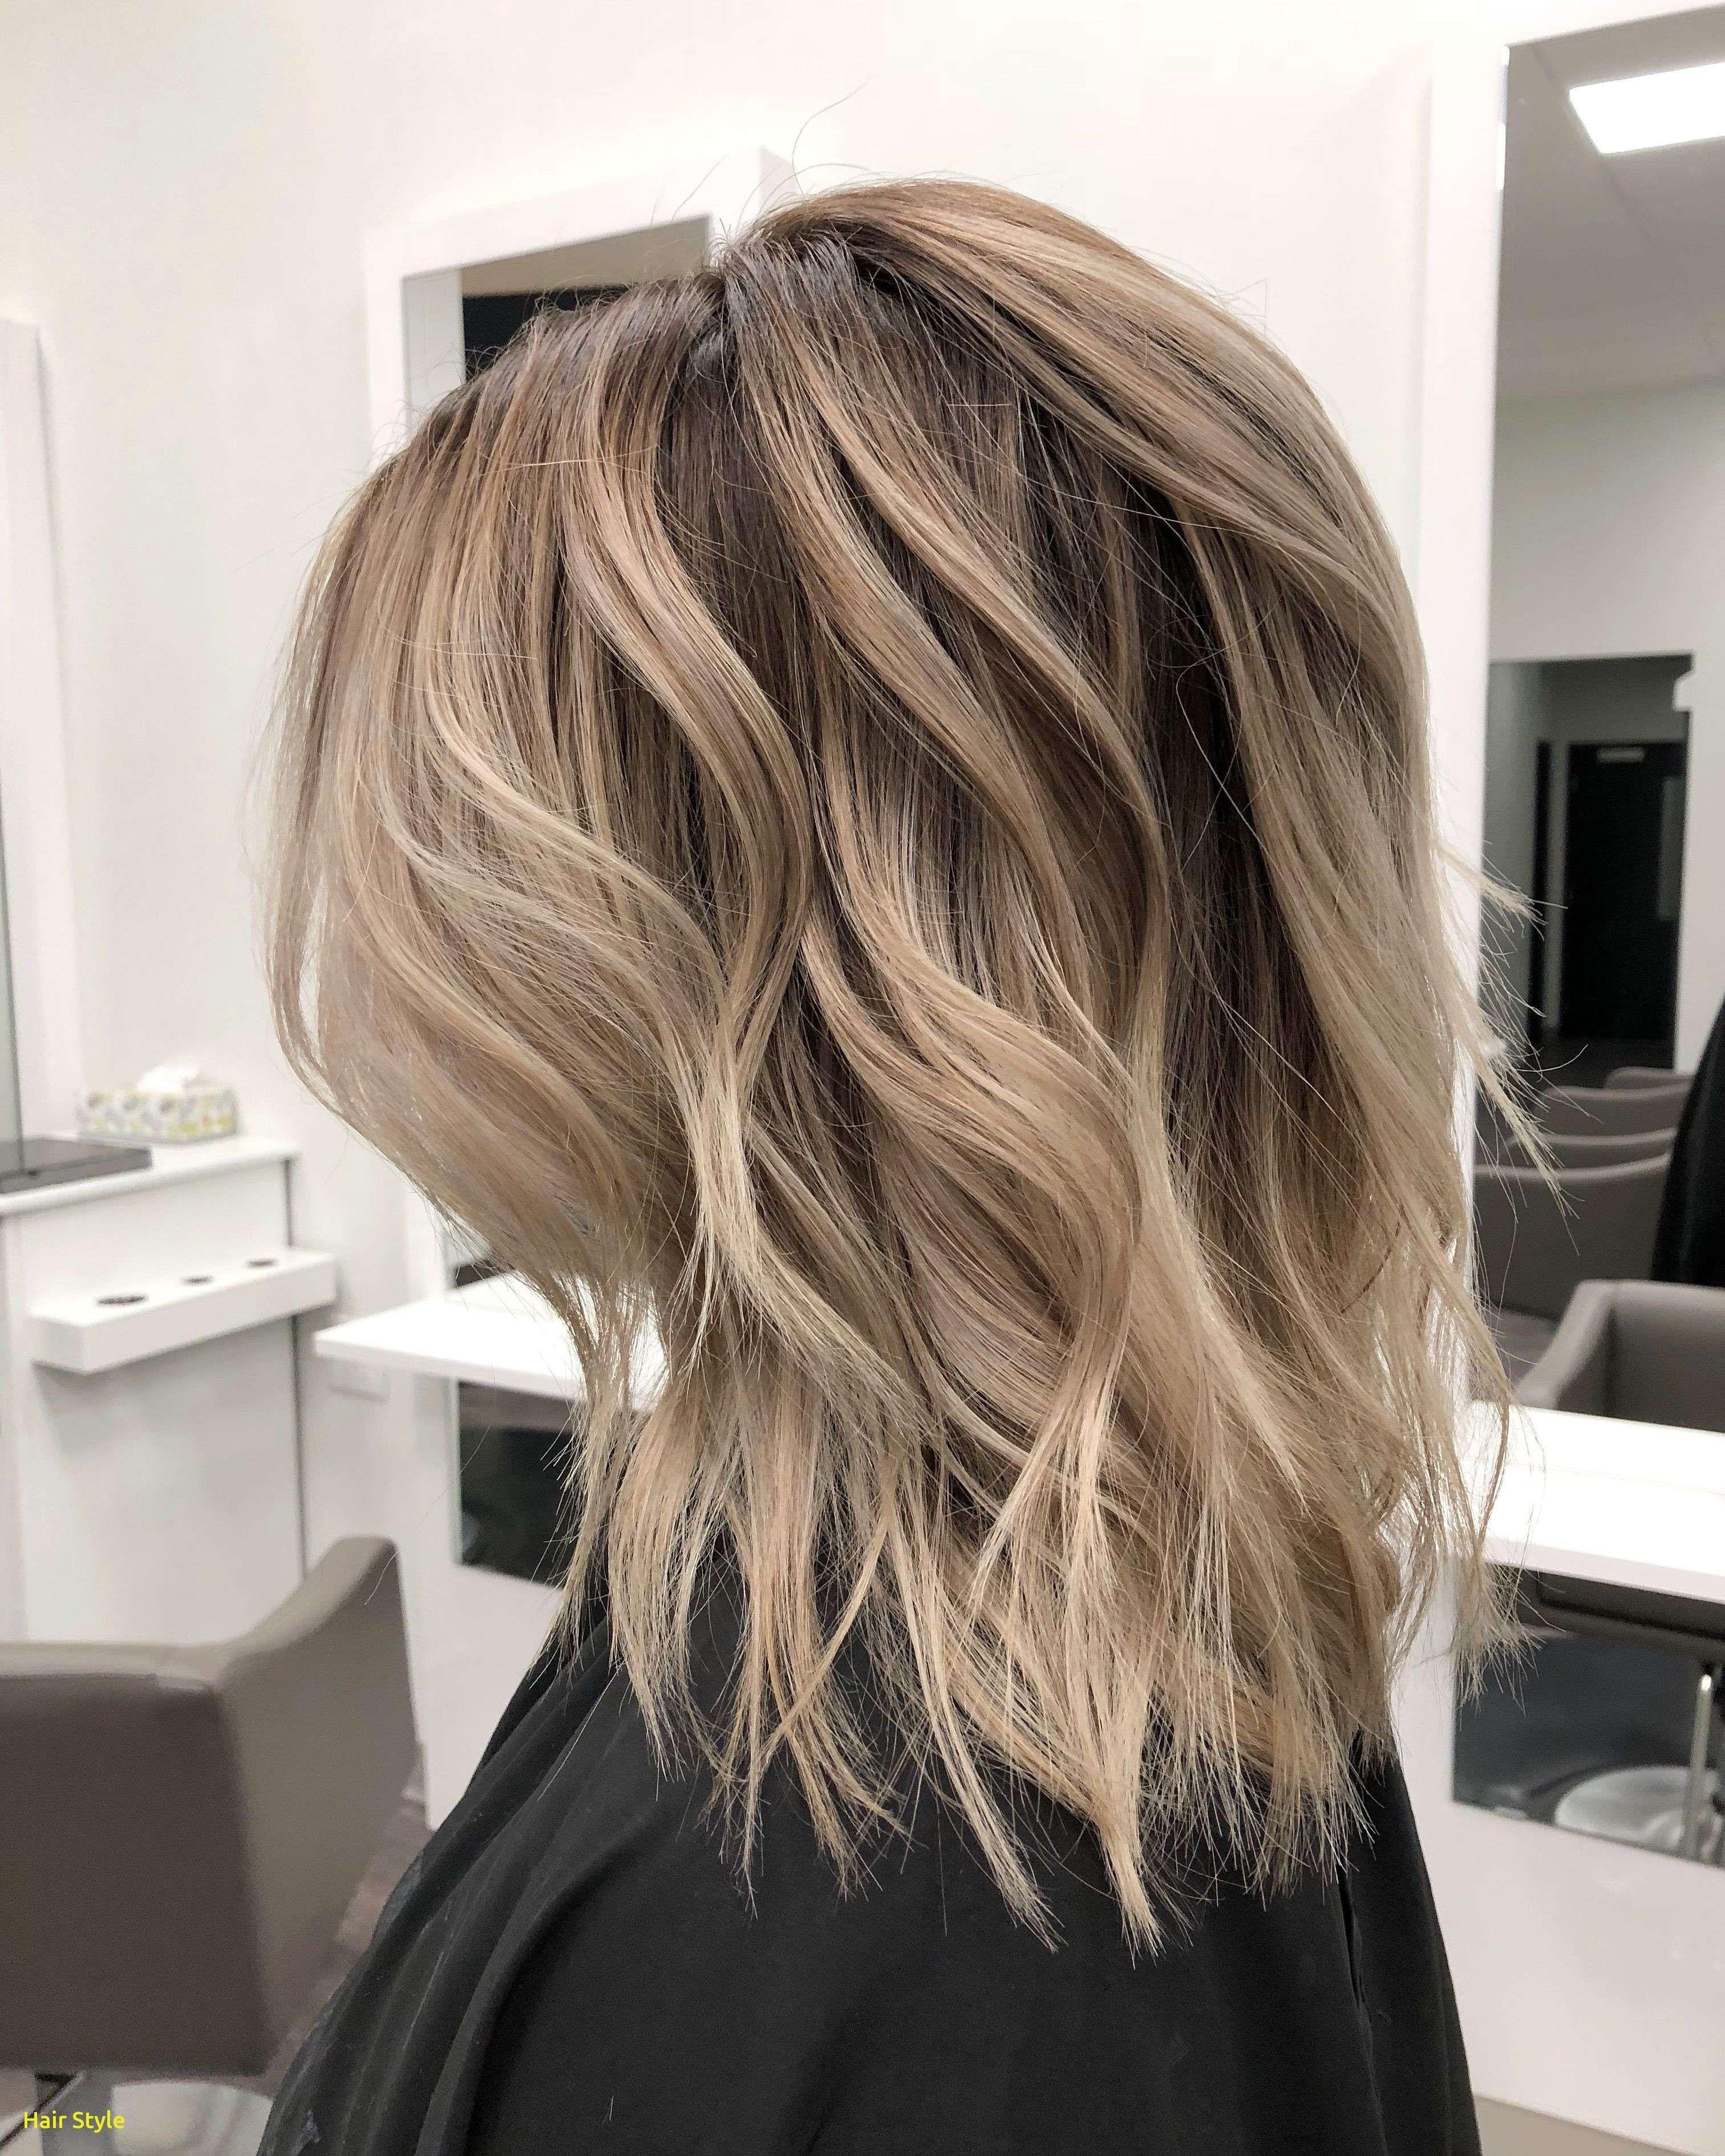 Elegante Frisuren Sommer 2019 Haare Trends 2019 Frisuren Mit